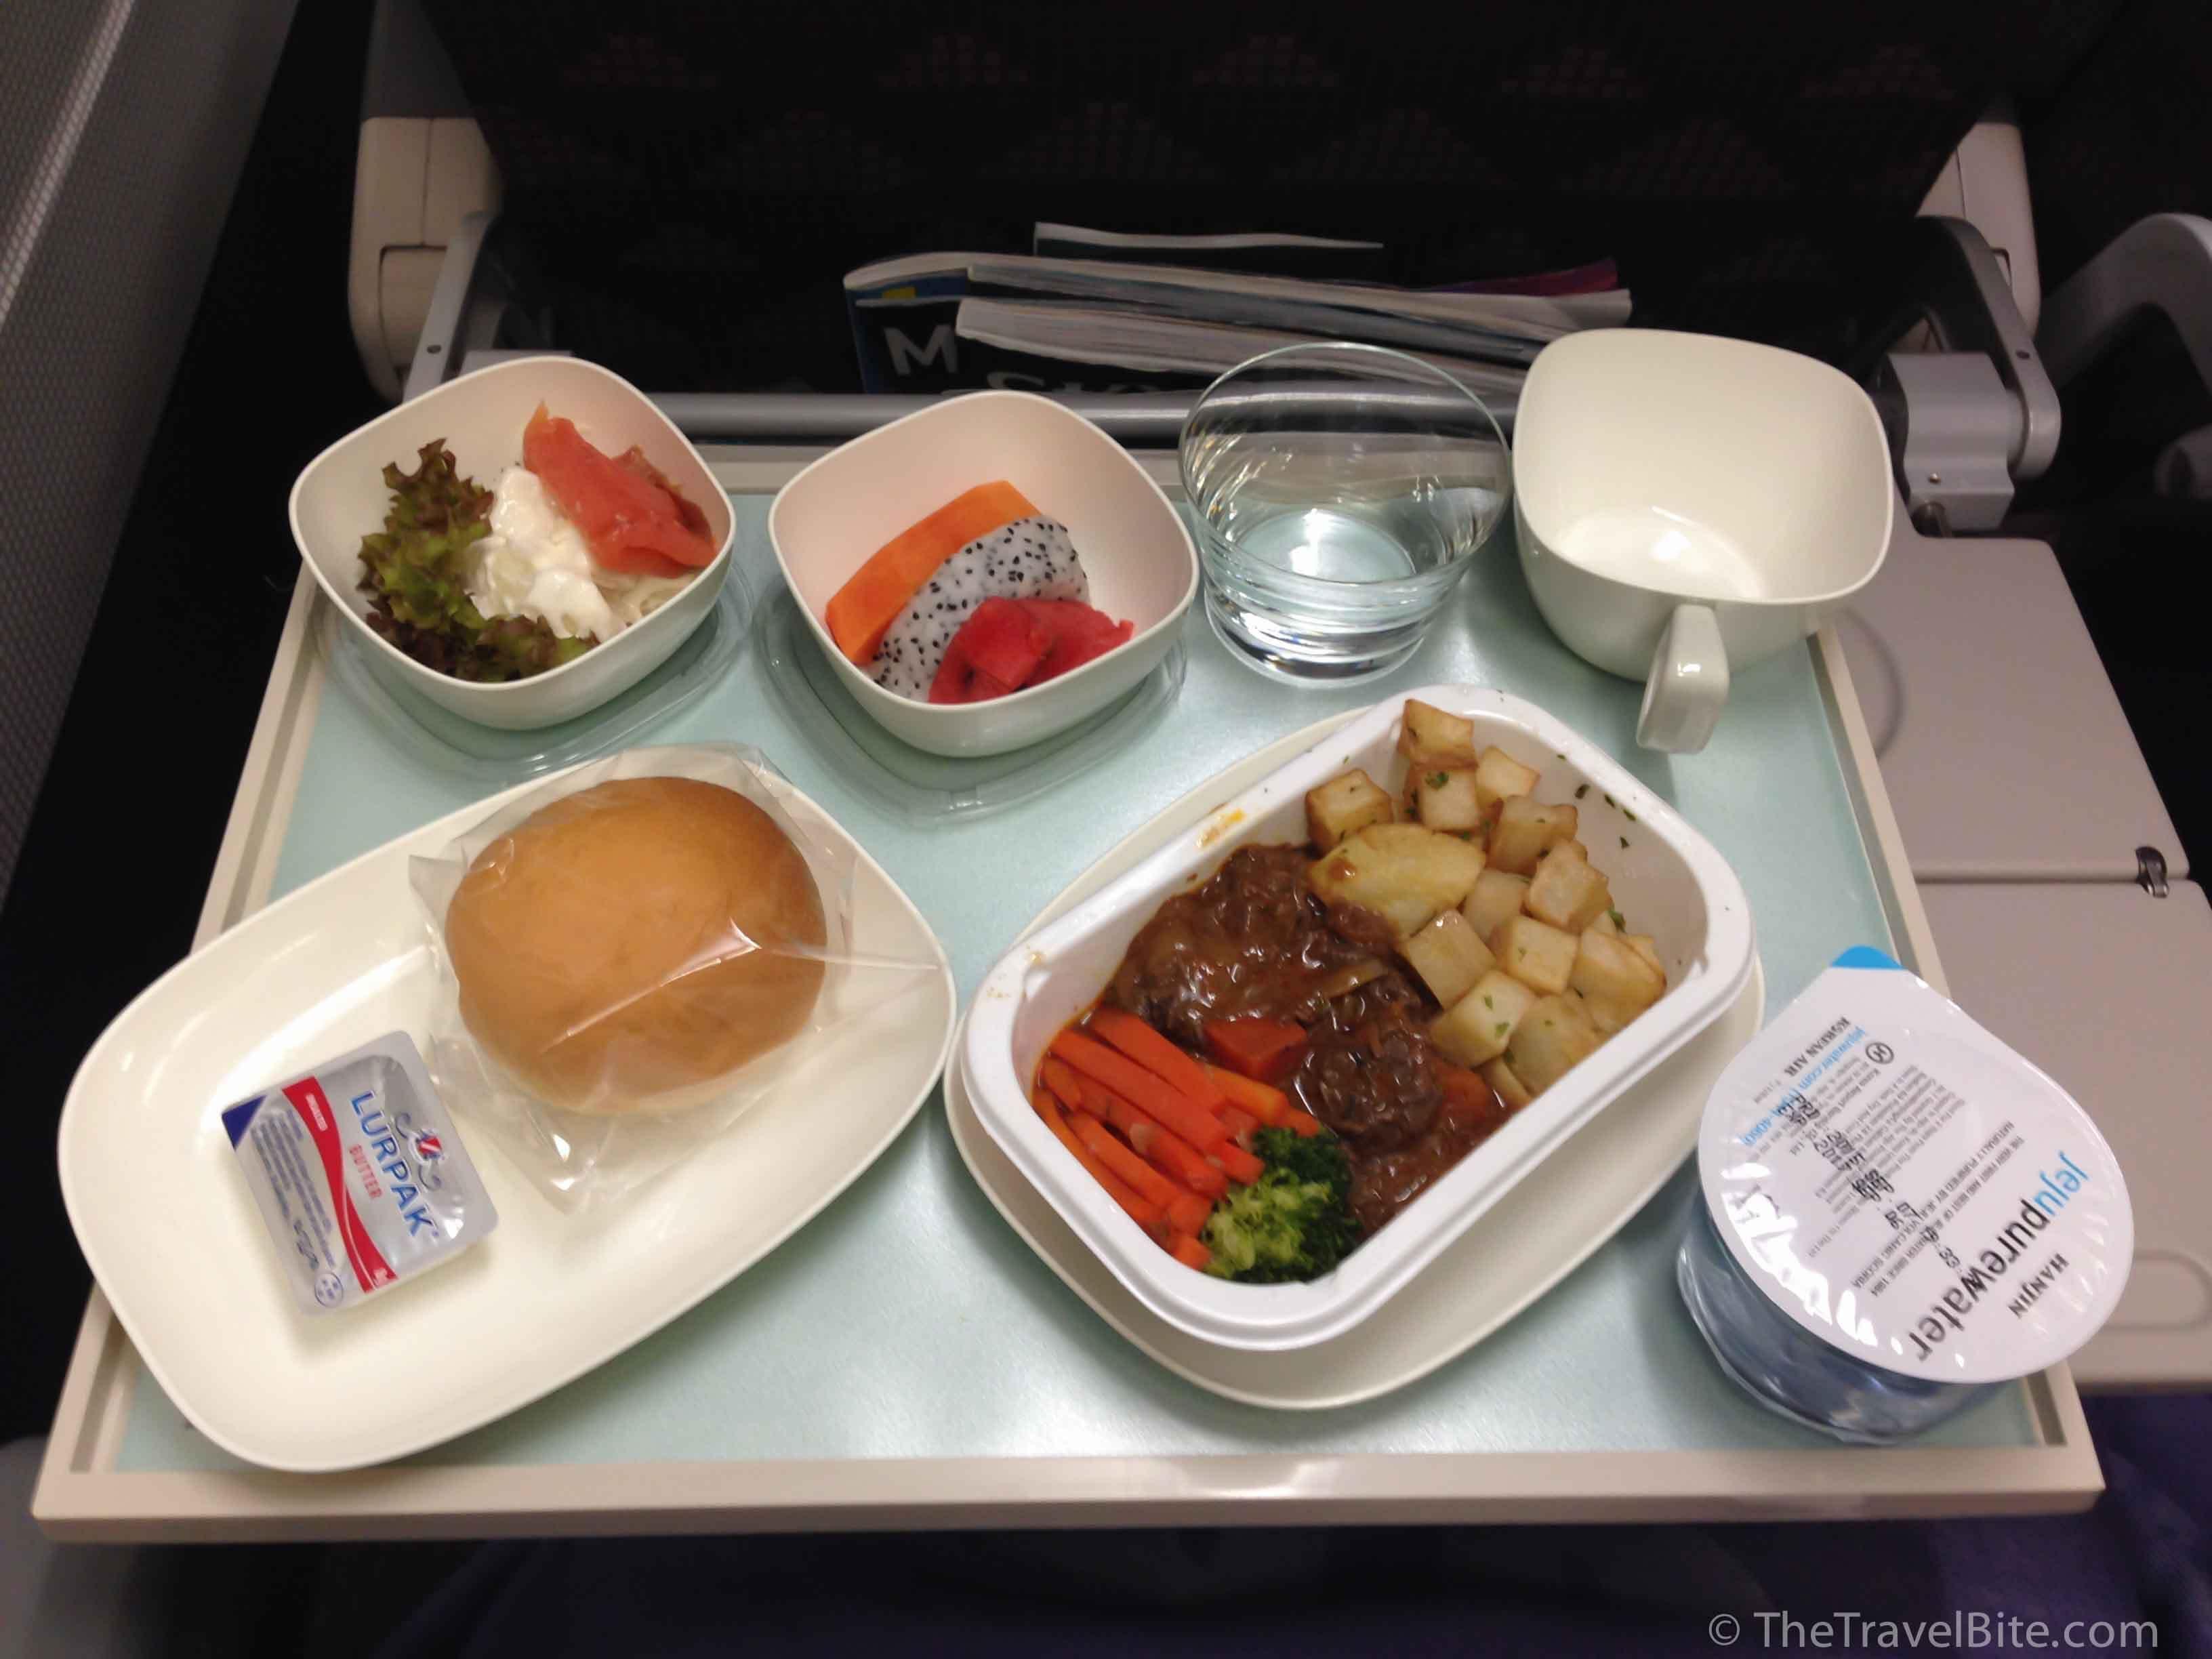 Korean Airlines Review Airline food, Korean airlines